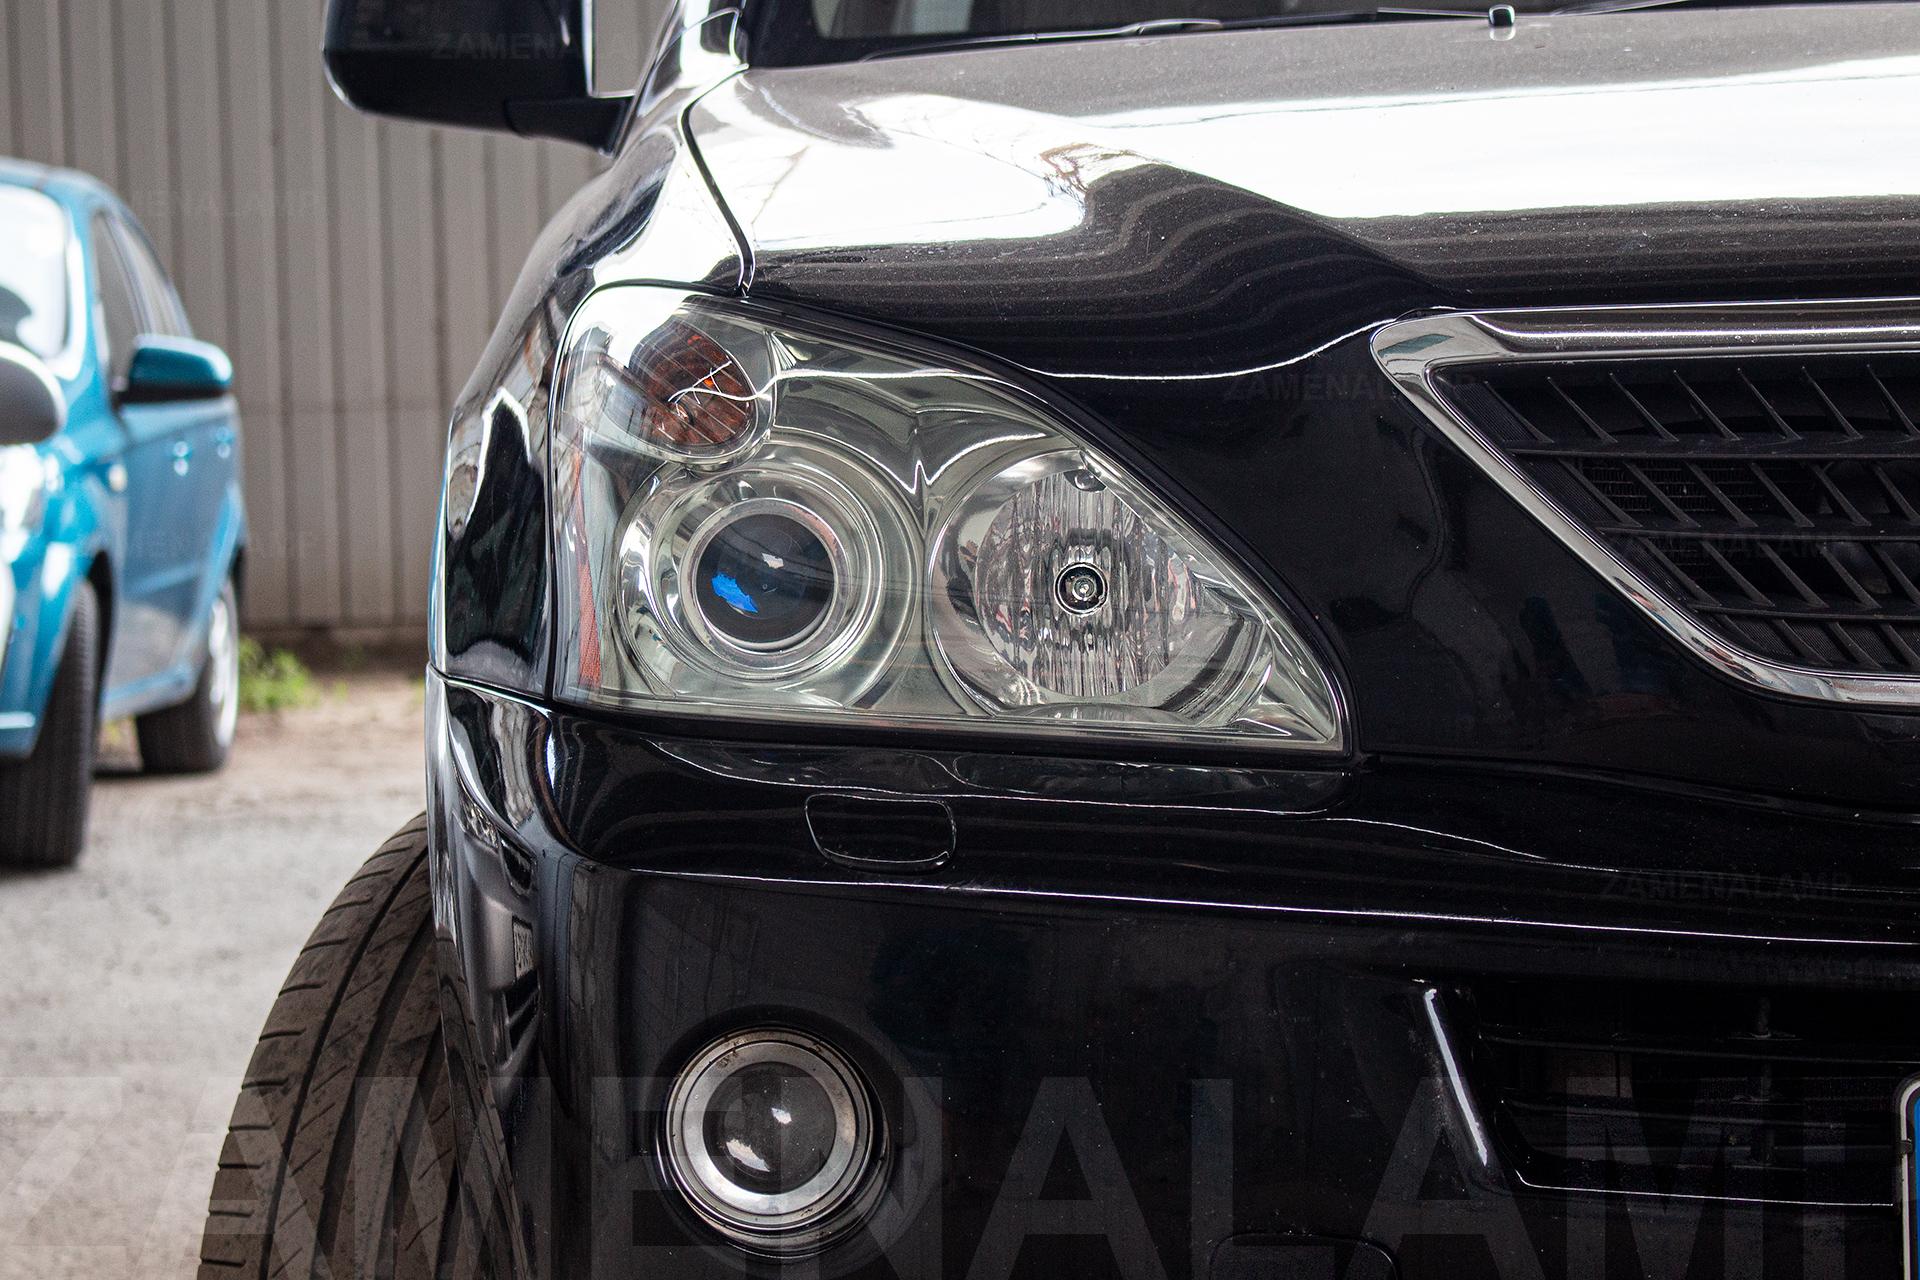 LEXUS RX 350 замена штатных линз на Hella 5 Blue